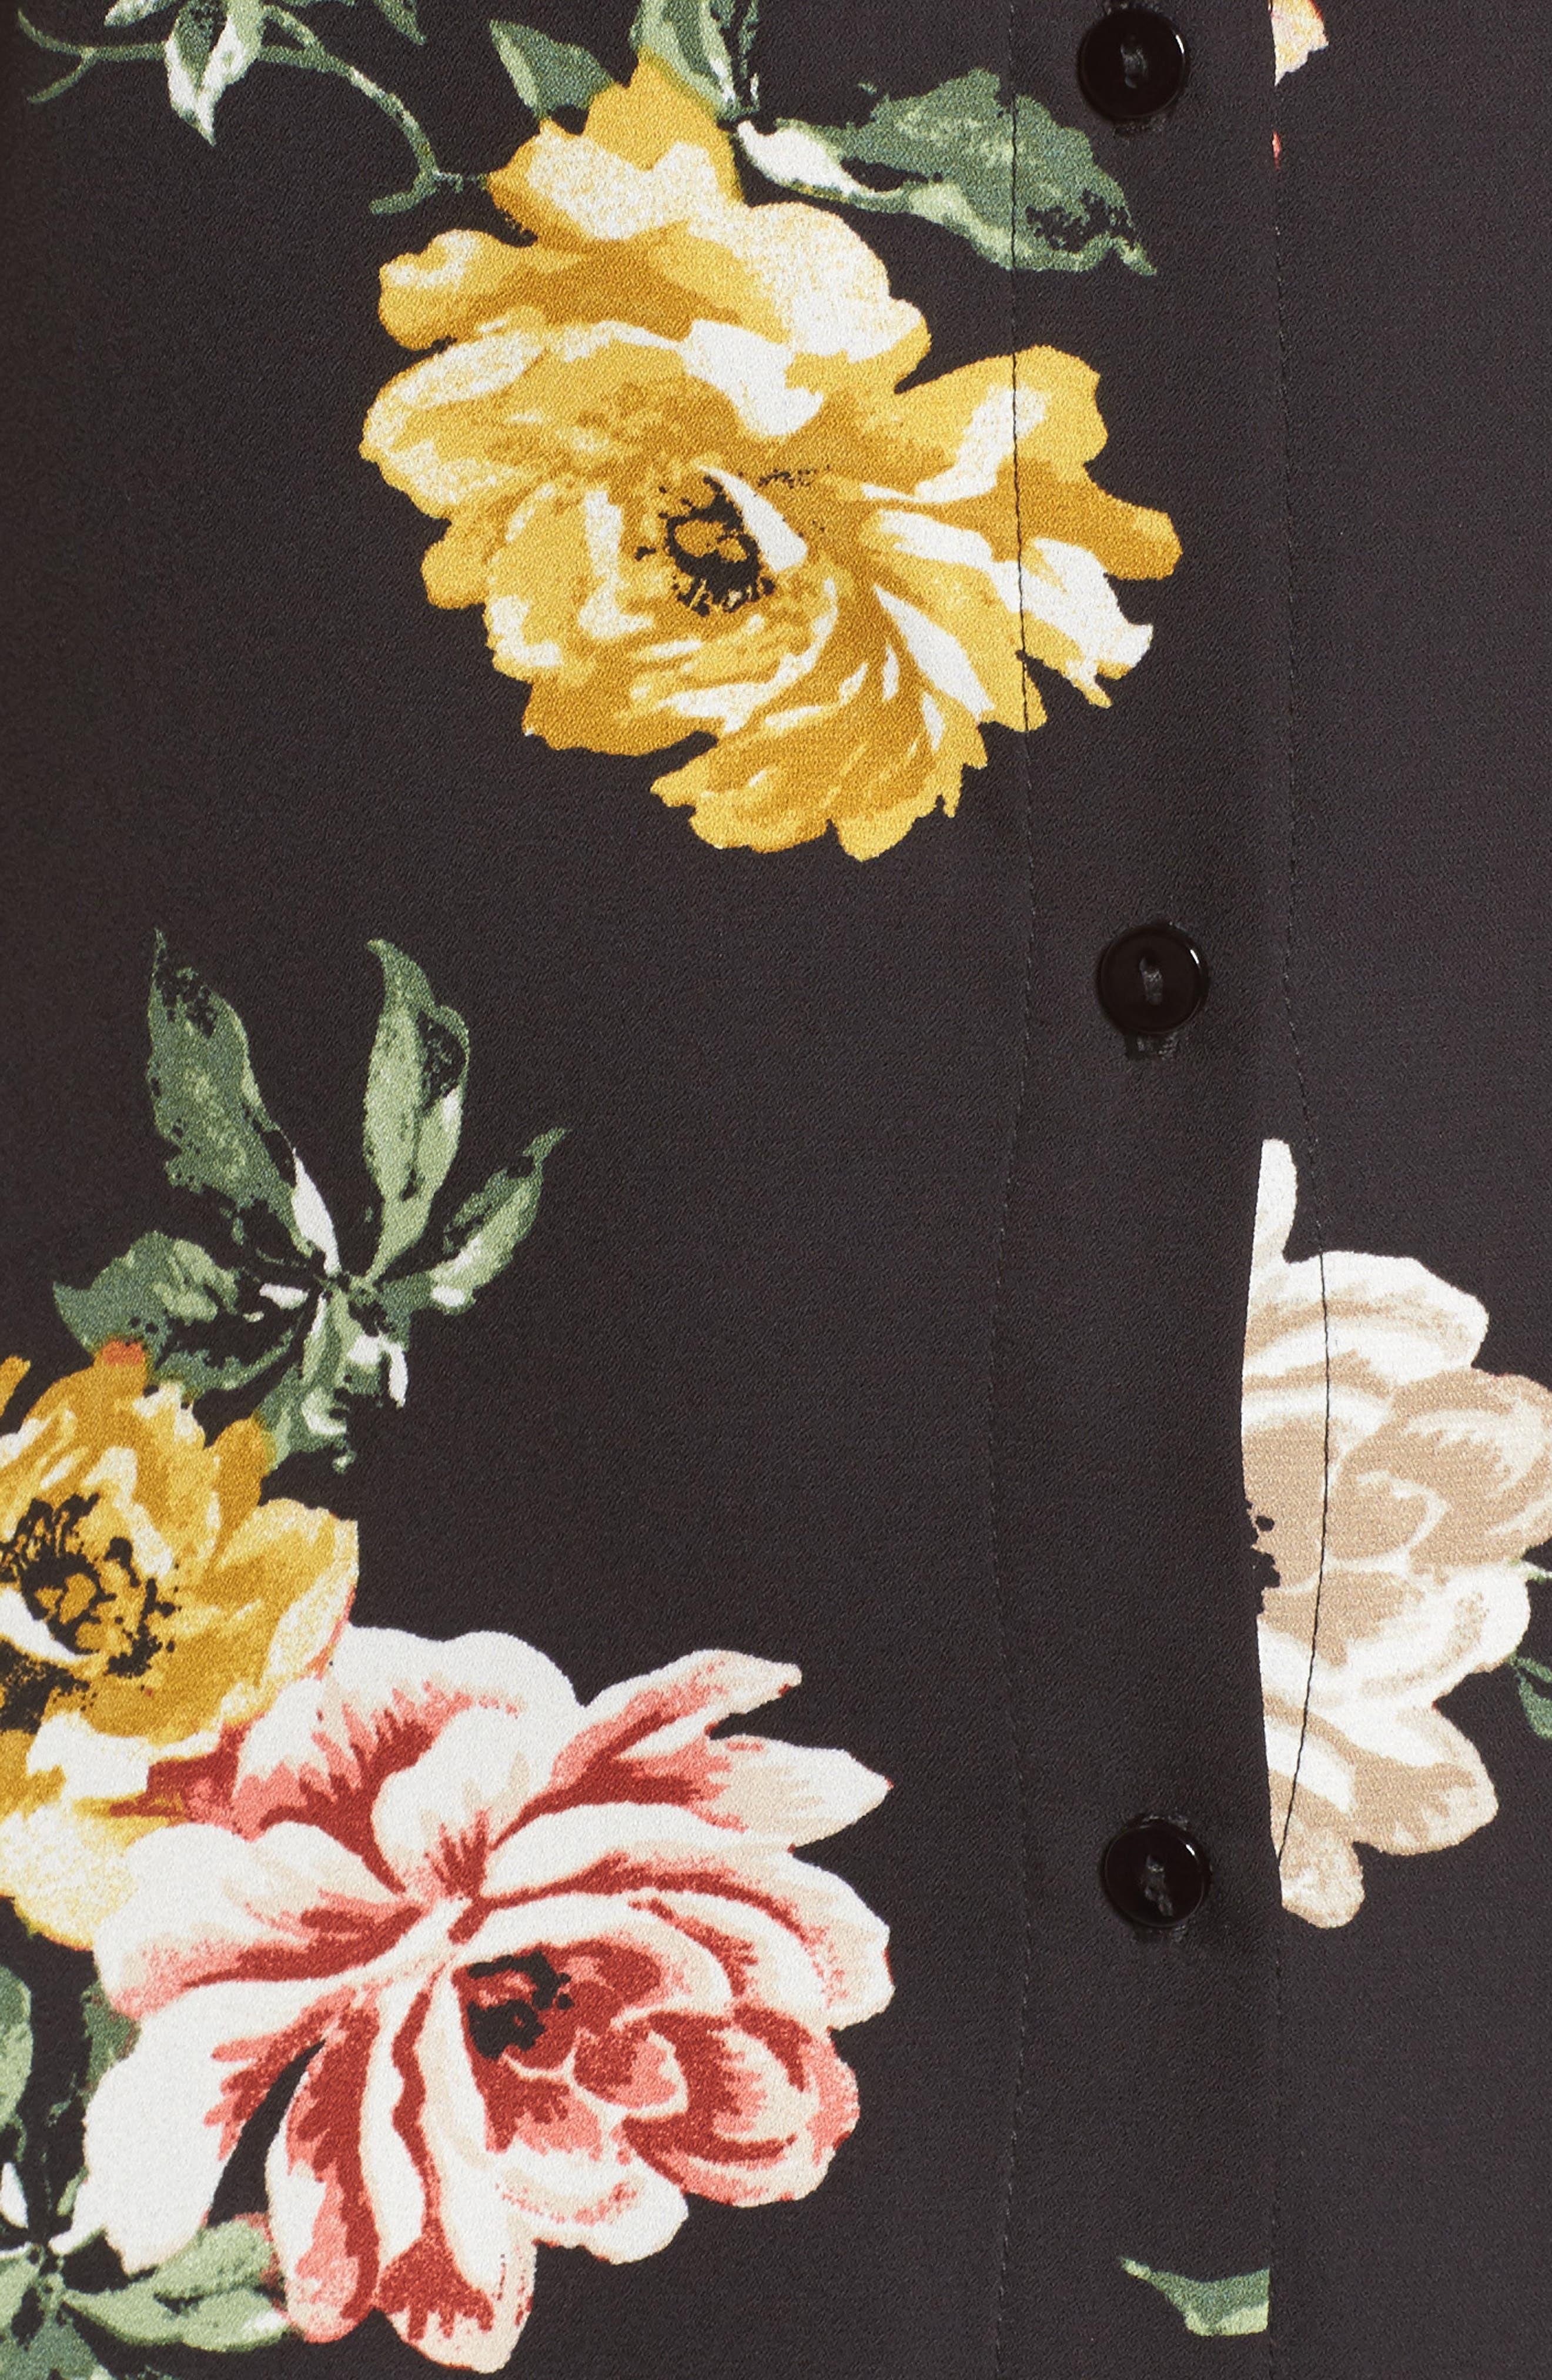 Floral Ruffle Strap Maxi Dress,                             Alternate thumbnail 5, color,                             001